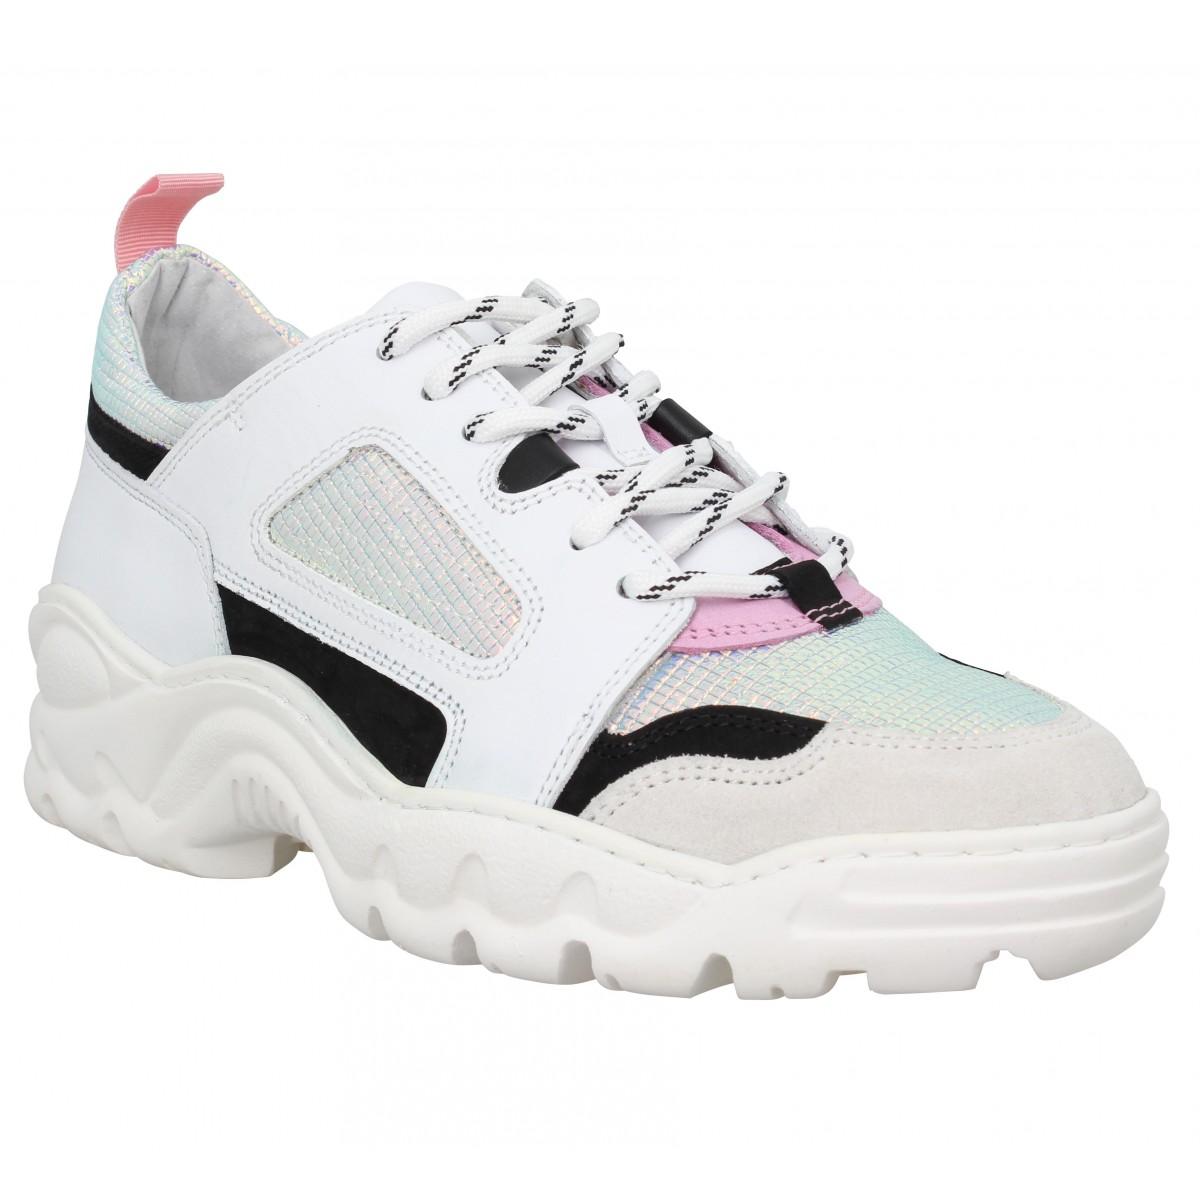 D.A.T.E Marque Date Sneakers Prozac...